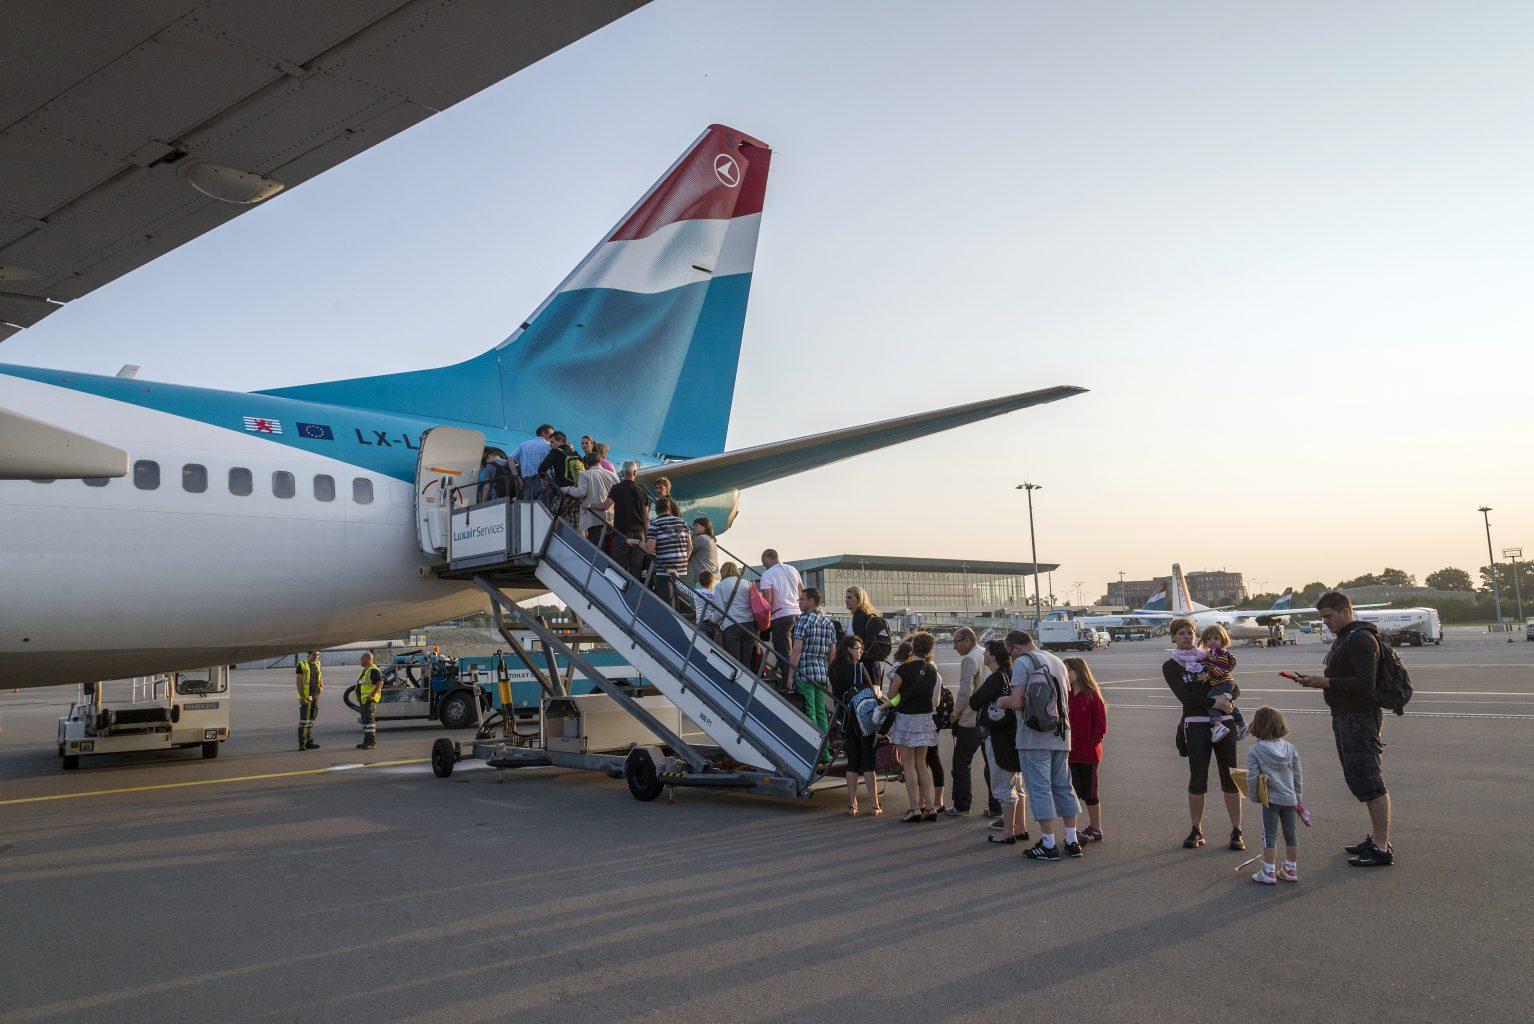 b737-700-lx-lgs-passengers-embarking-through-the-rear-546